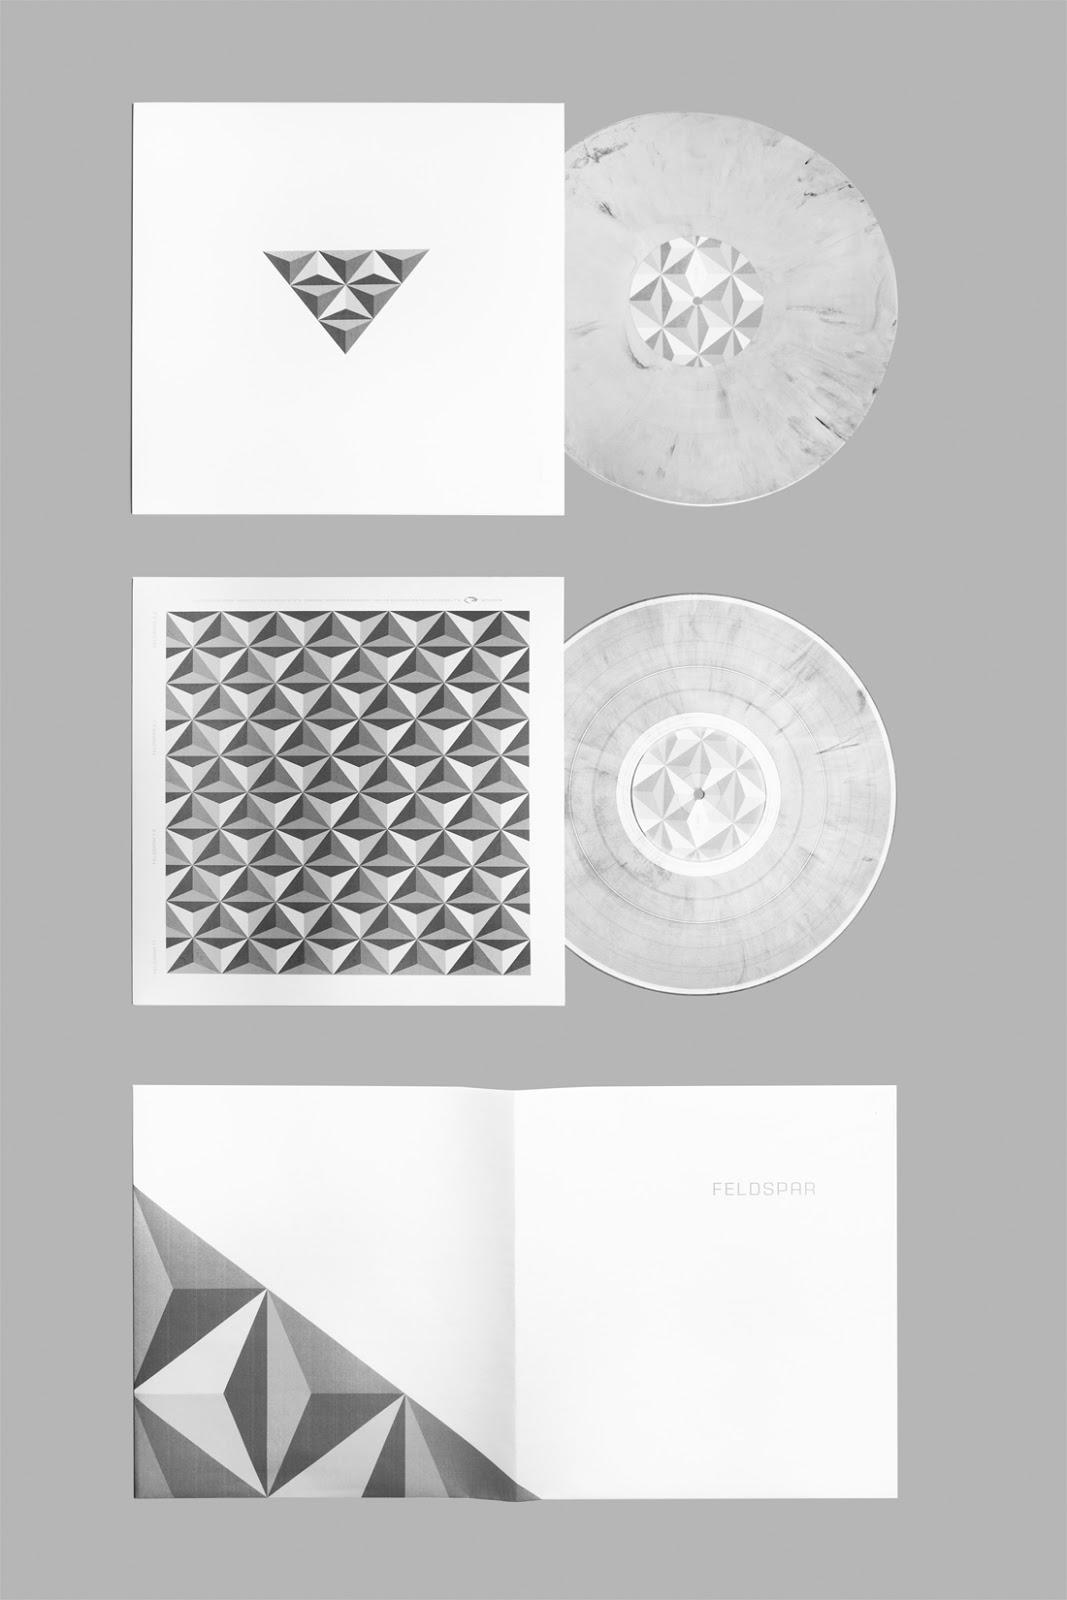 Feldspar On Packaging Of The World Creative Package